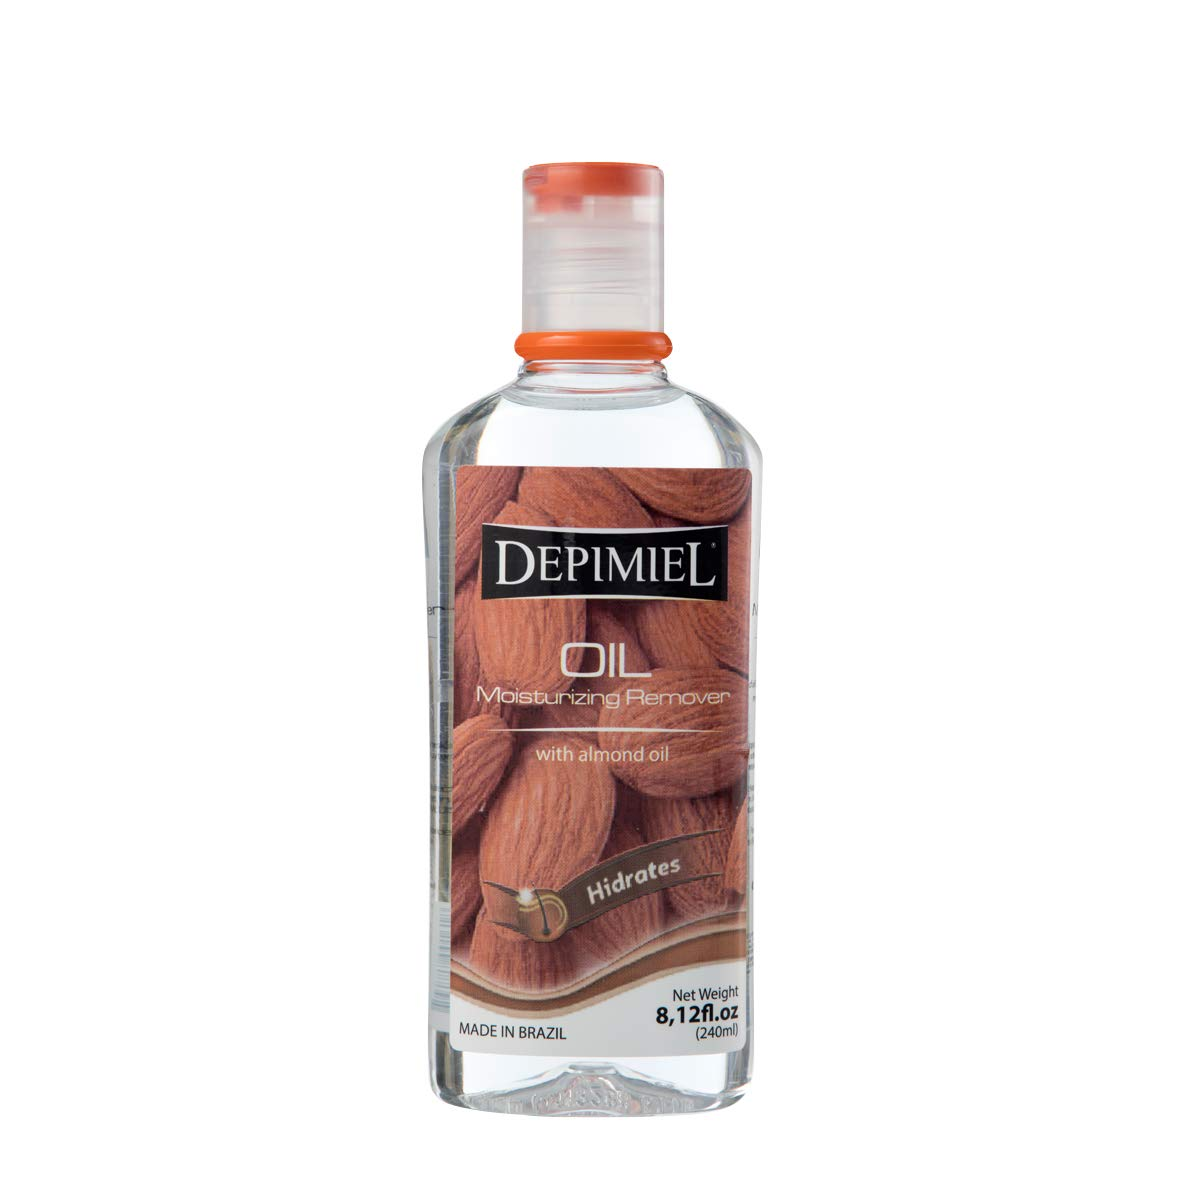 Depimiel Post-Depilatory Almond Oil Moisturizing